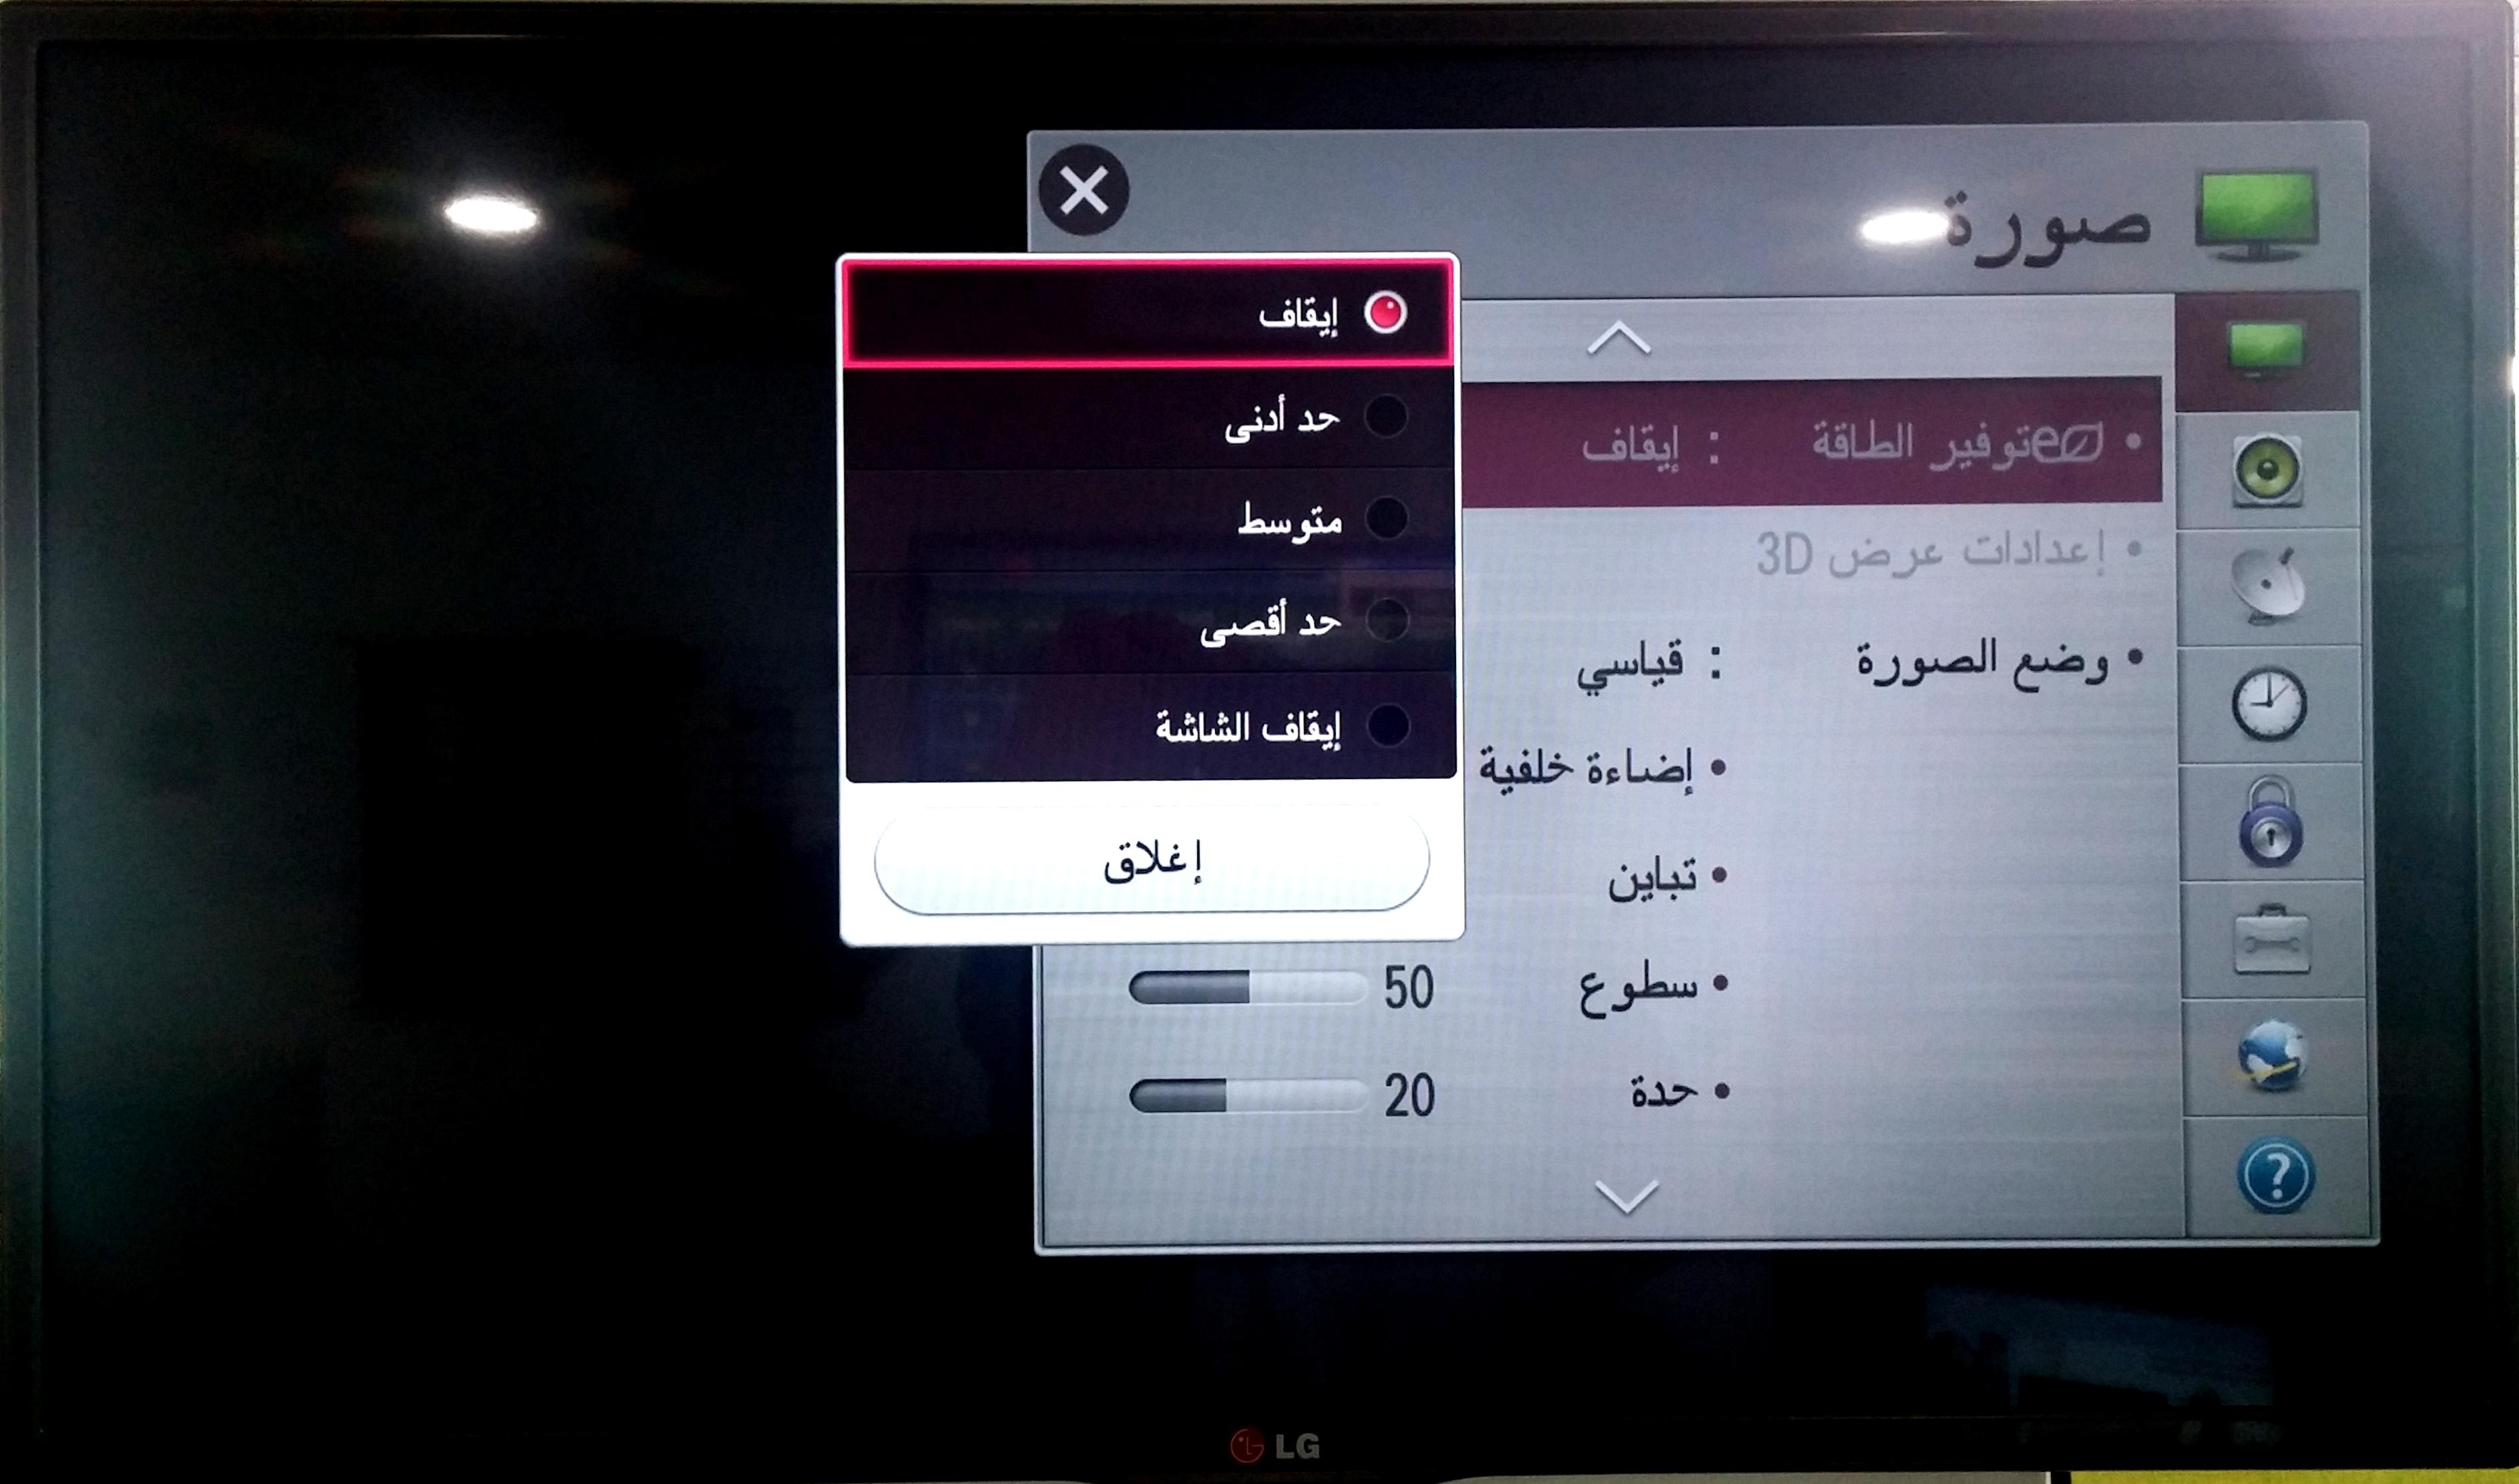 Lg الكيفية والنصائح Netcastإضاءة ضعيفه او صوره خافته Lg Egypt